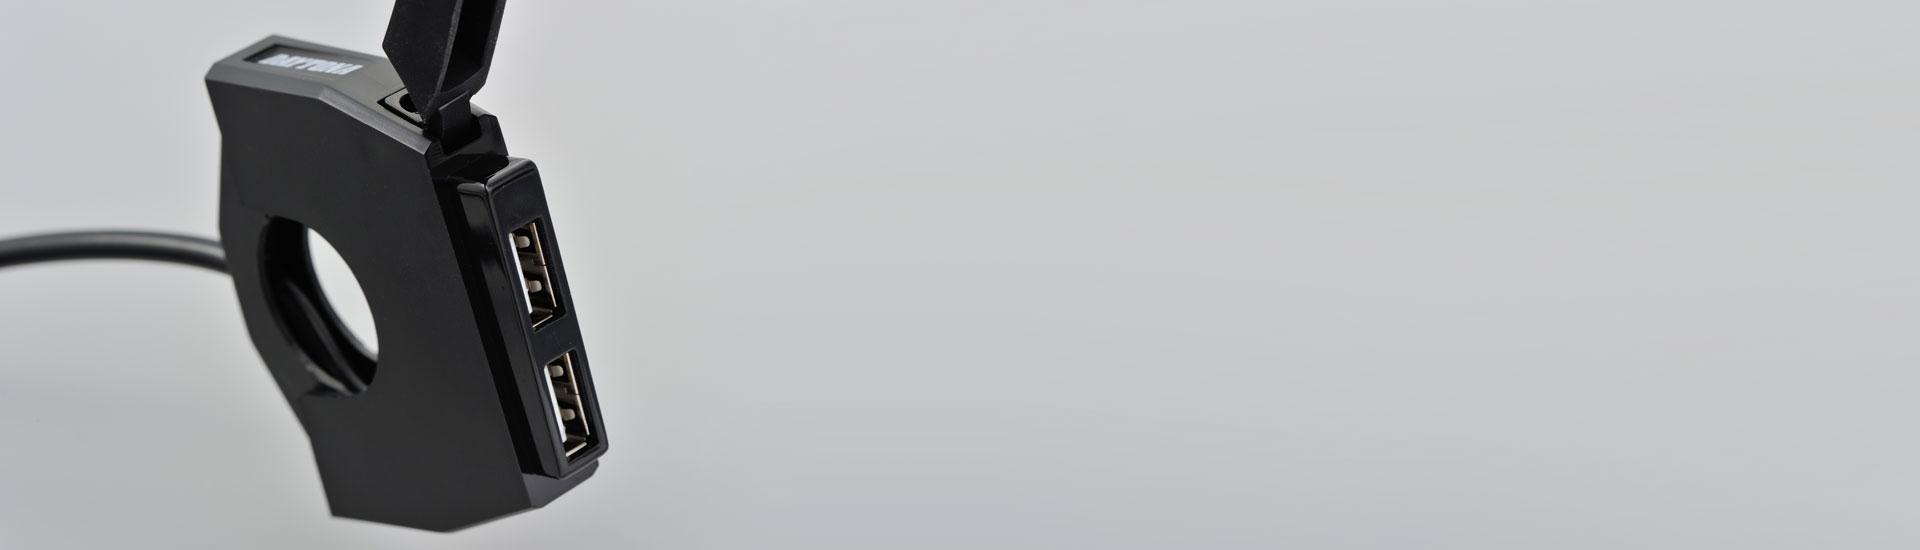 Daytona-98438-slim-usb-dual-shop-banner-1500x1000-1